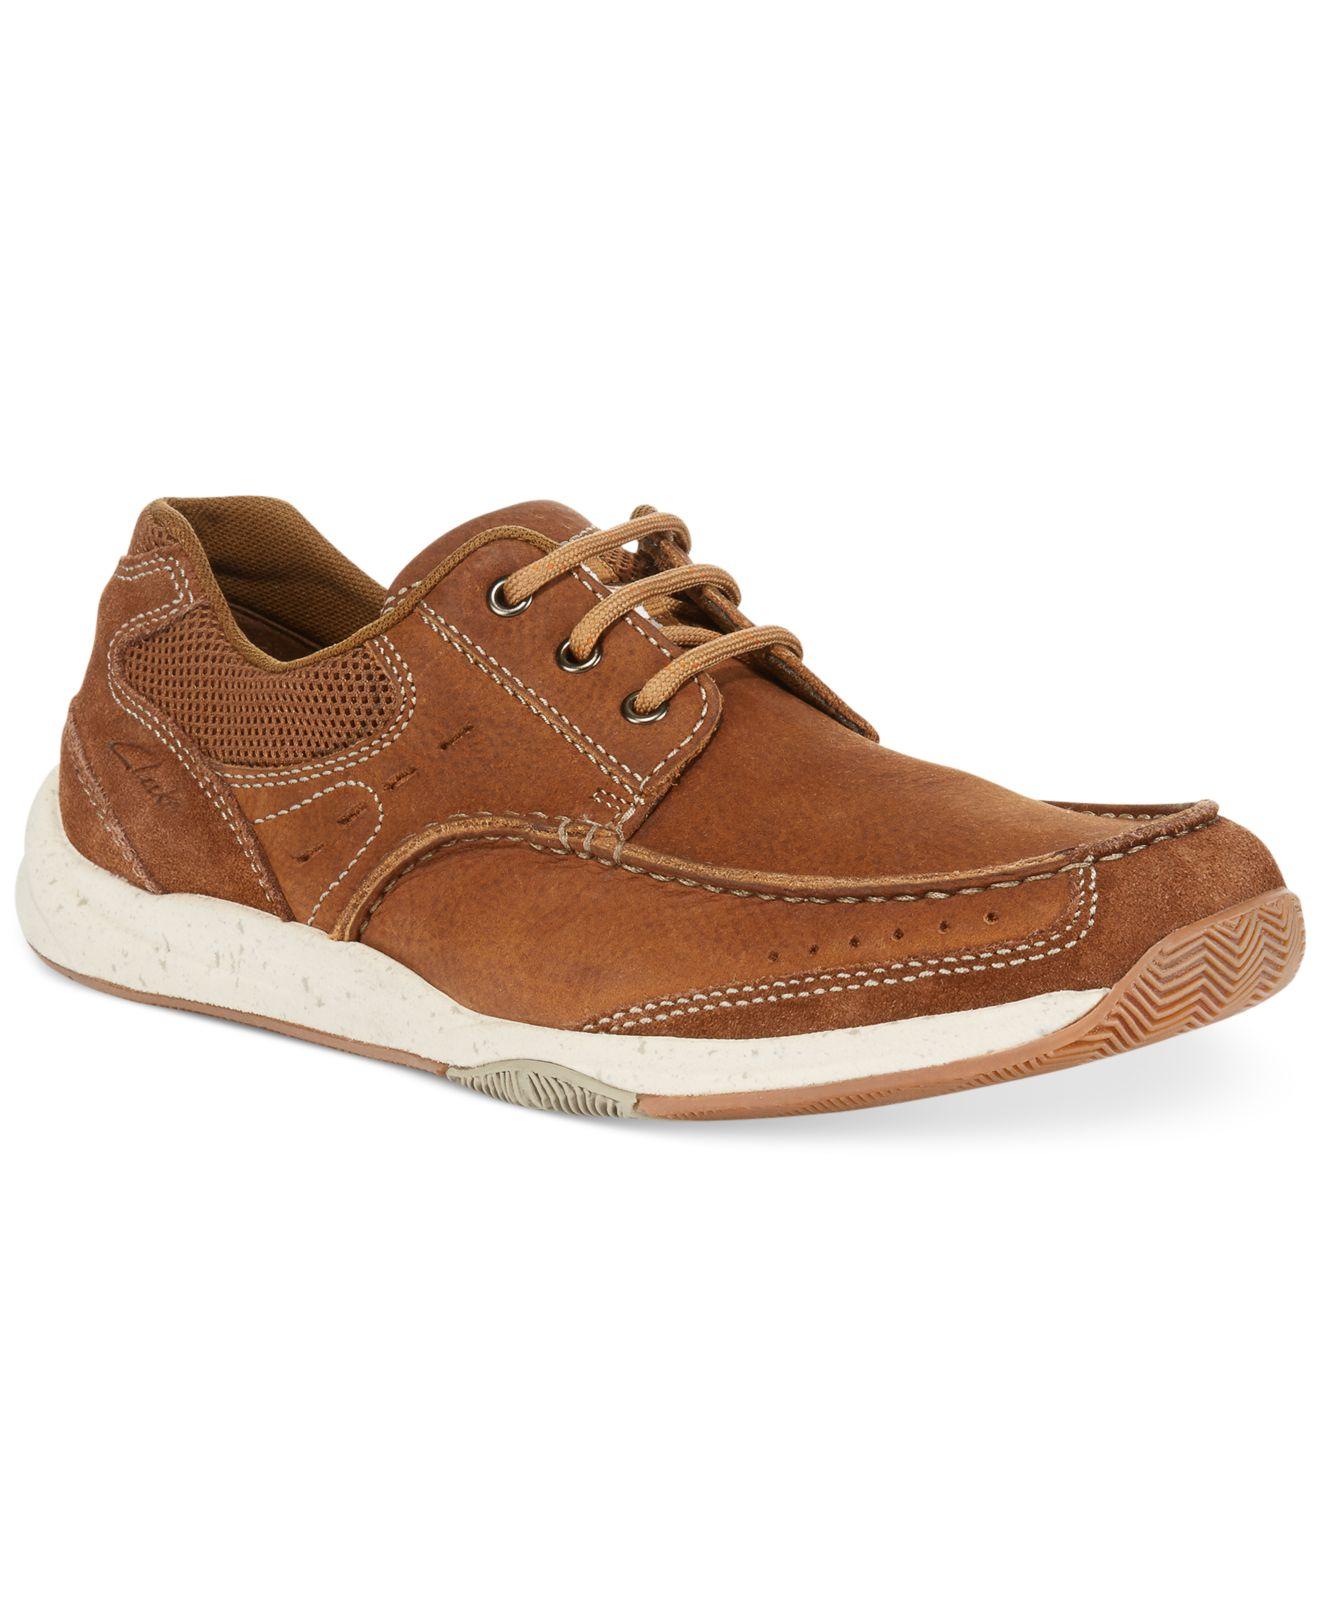 Clarks Shoes Dublin